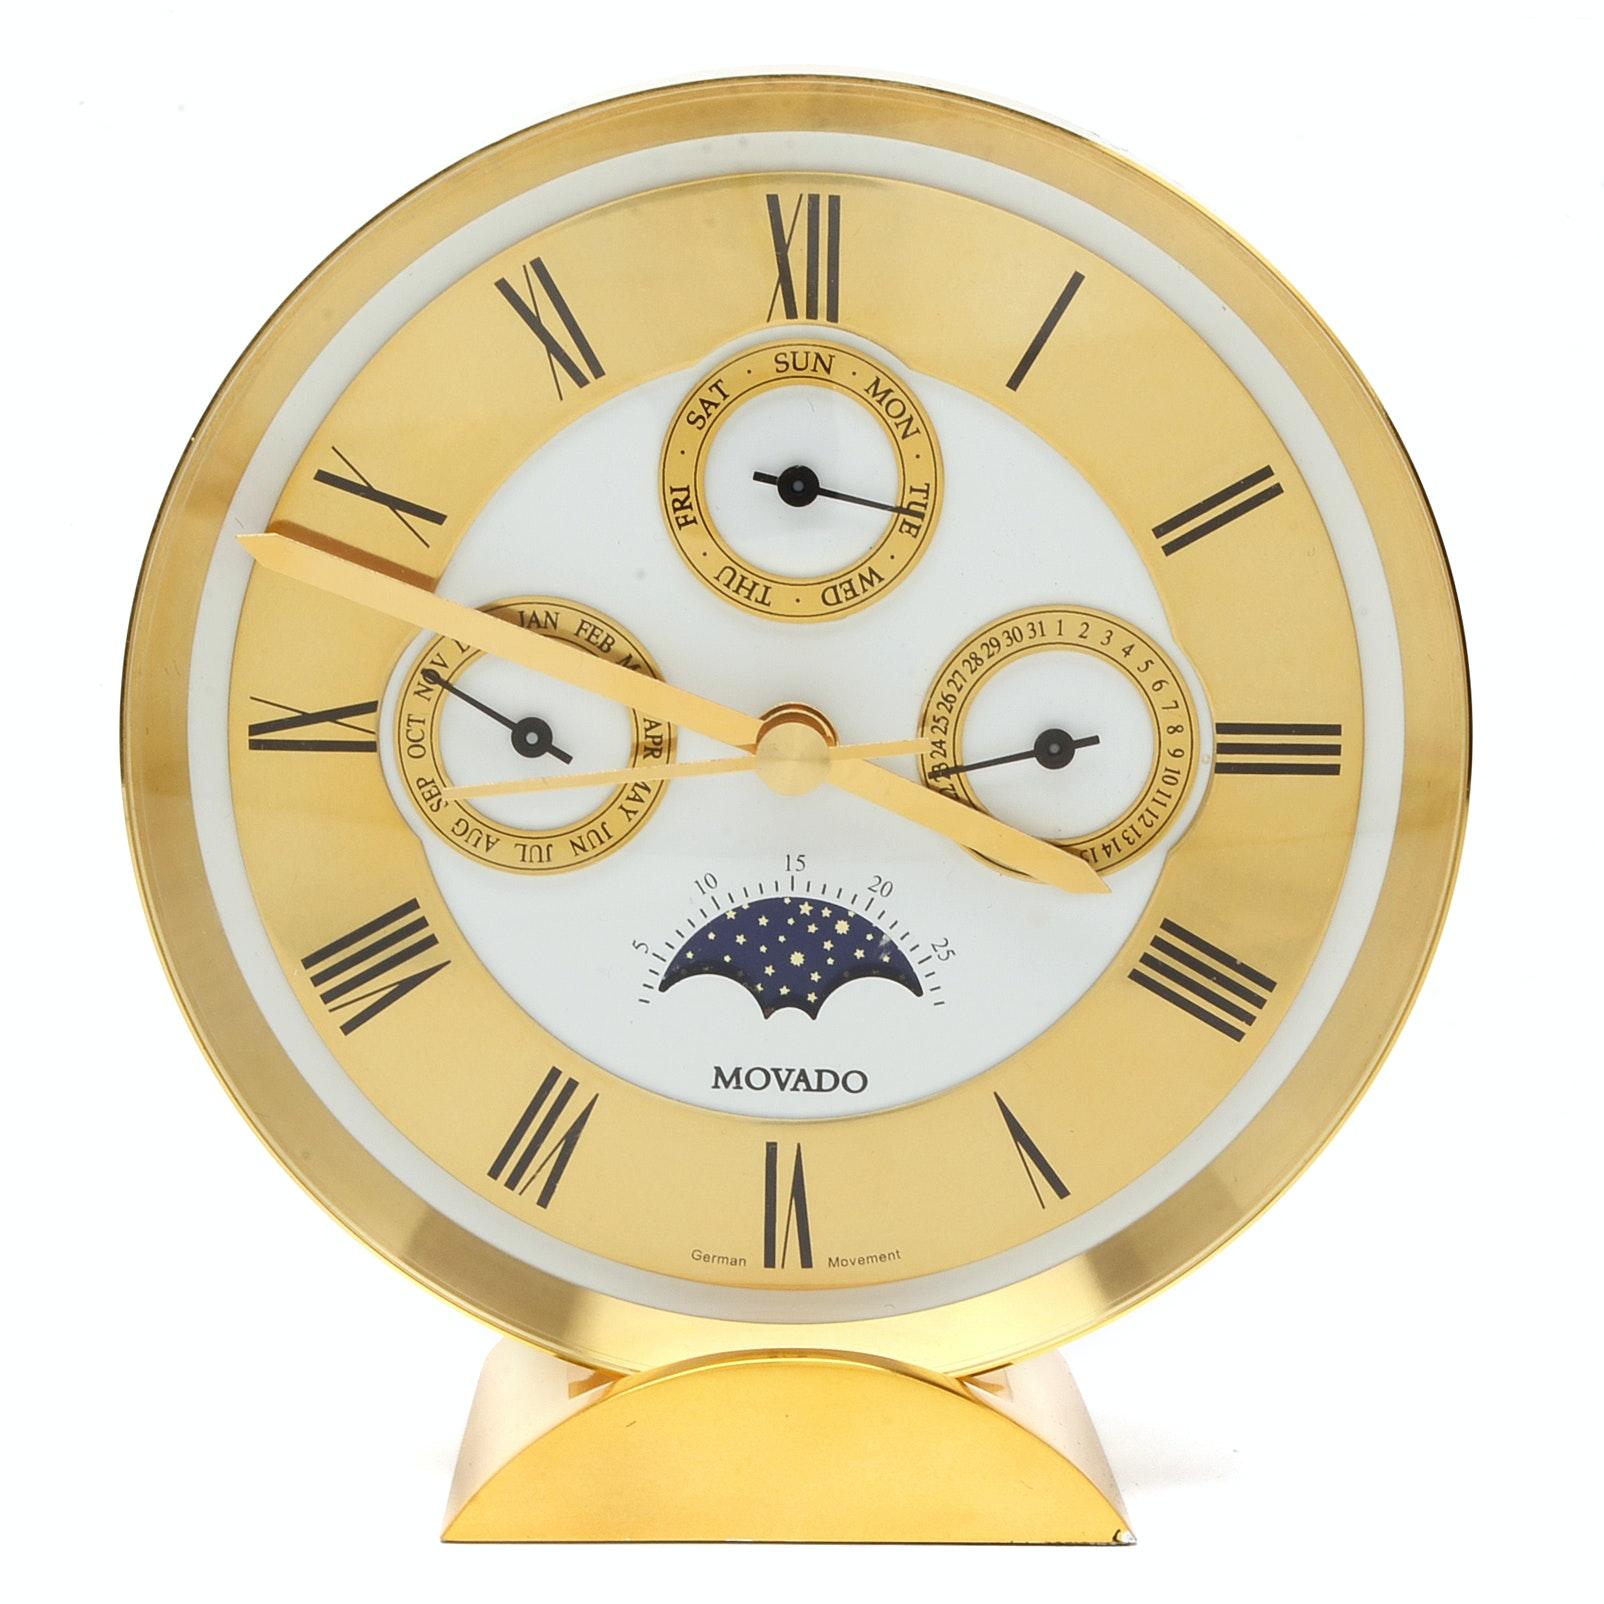 Movado Triple Calendar Moon Phase Brass Desk Clock with German Movement